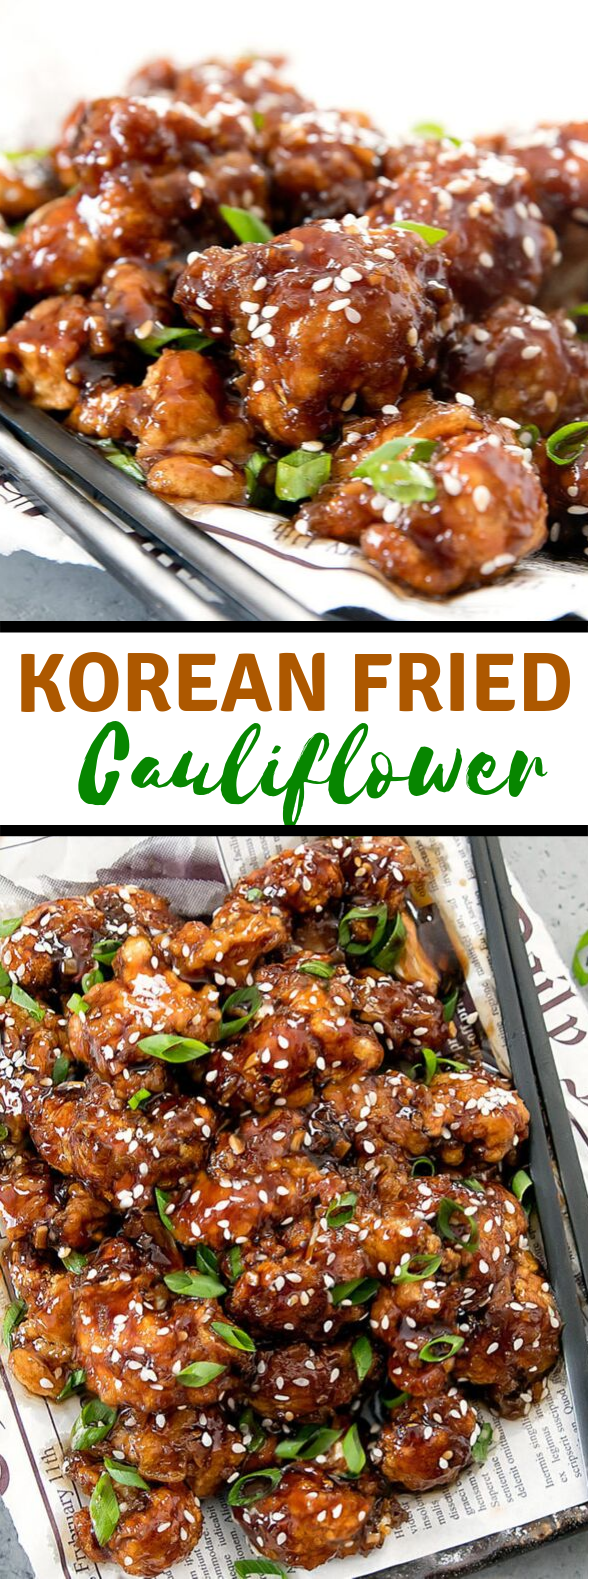 KOREAN FRIED CAULIFLOWER #vegetarian #friedchicken